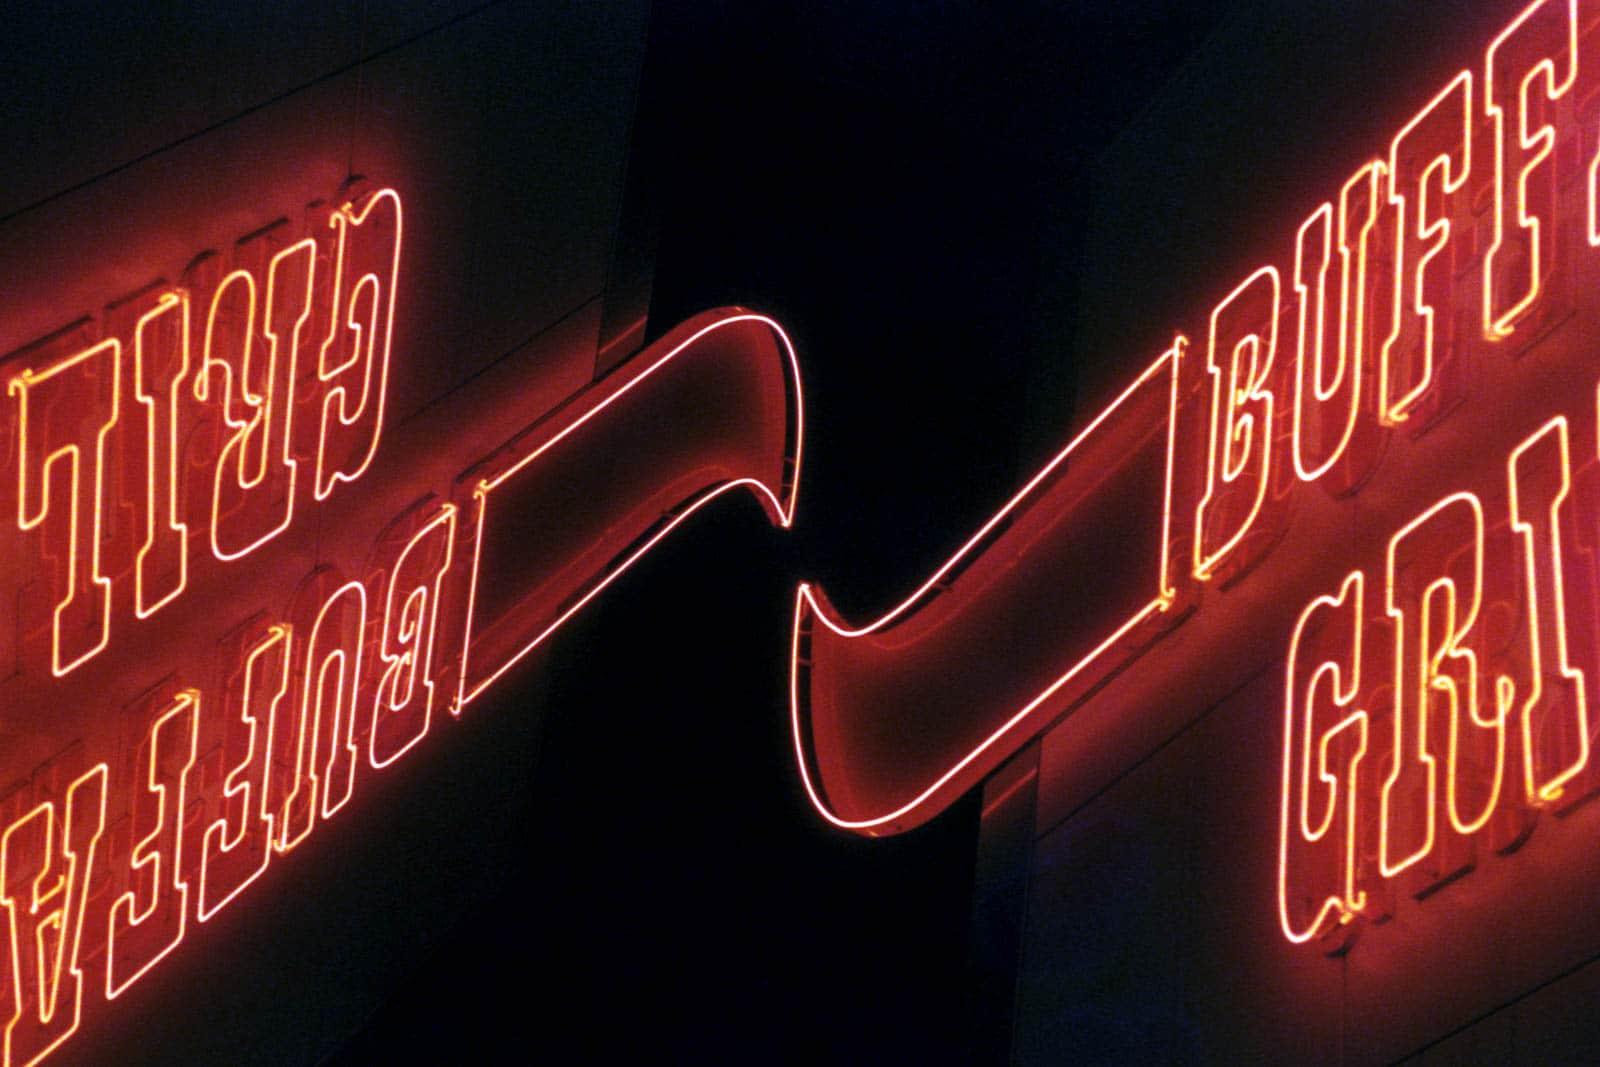 Philippe – Photographie nocturne/neon